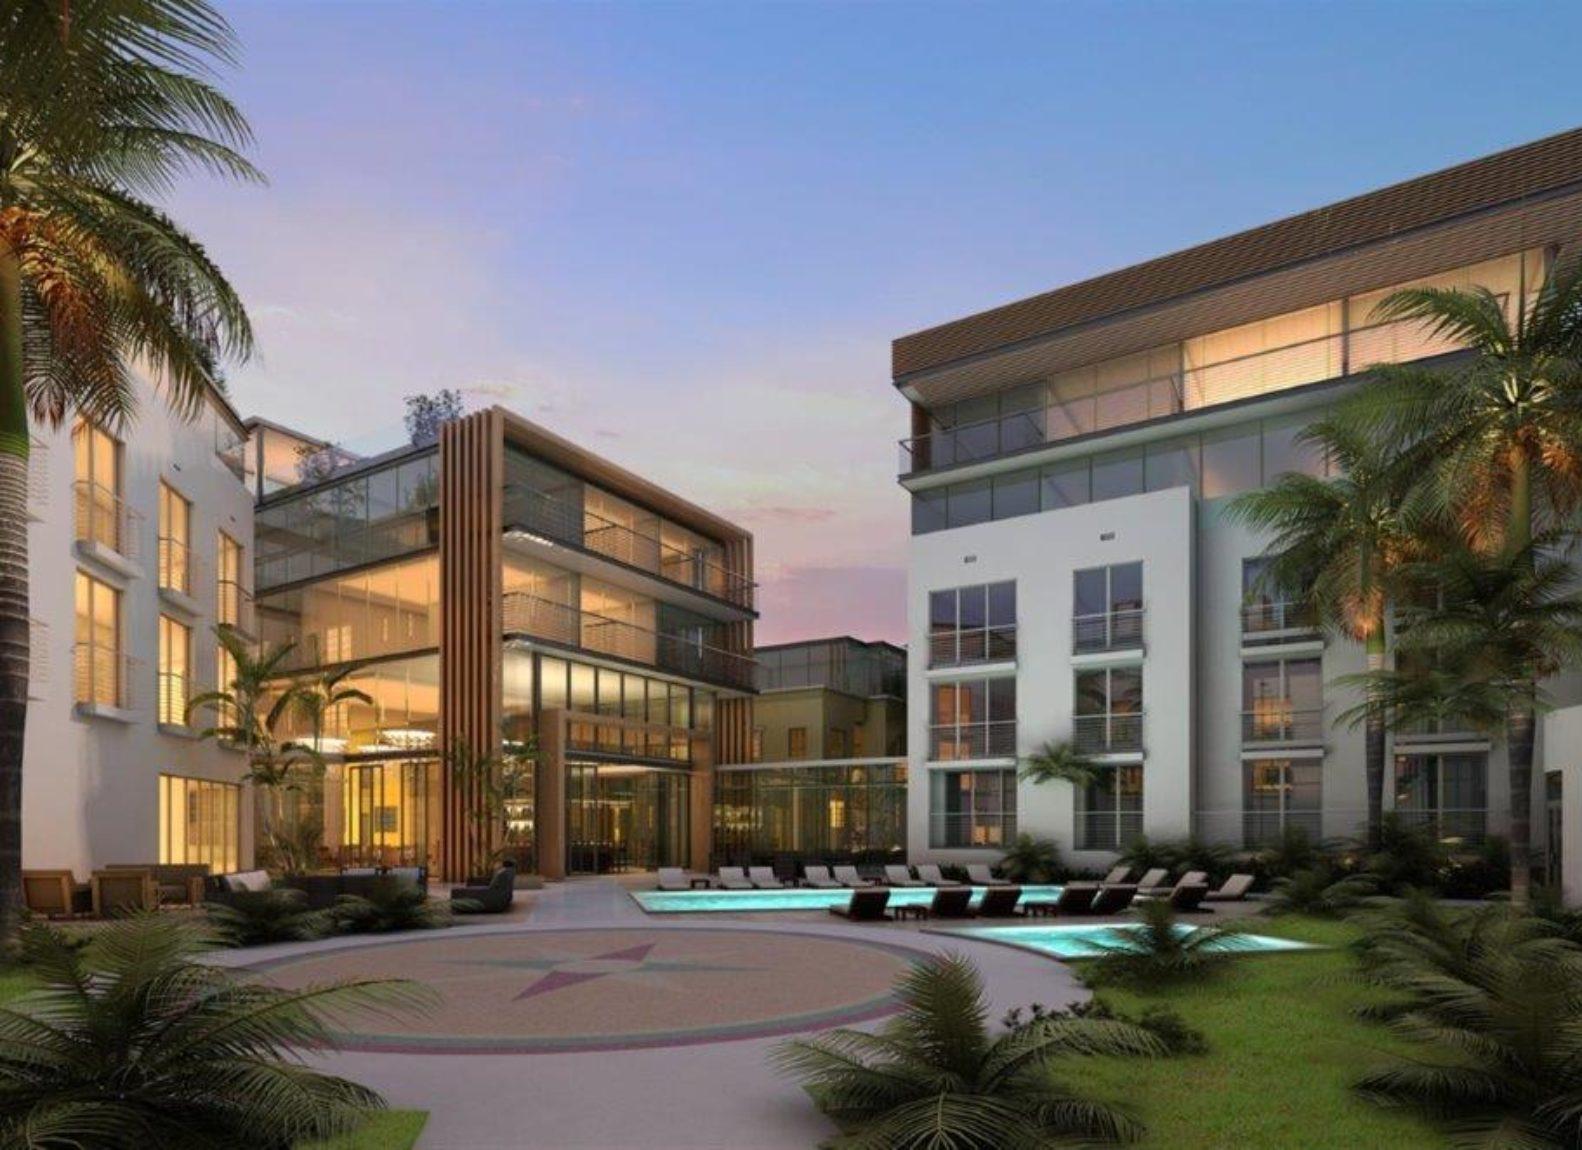 Collins park hotel epsylon - Residence principale de luxe kobi karp ...